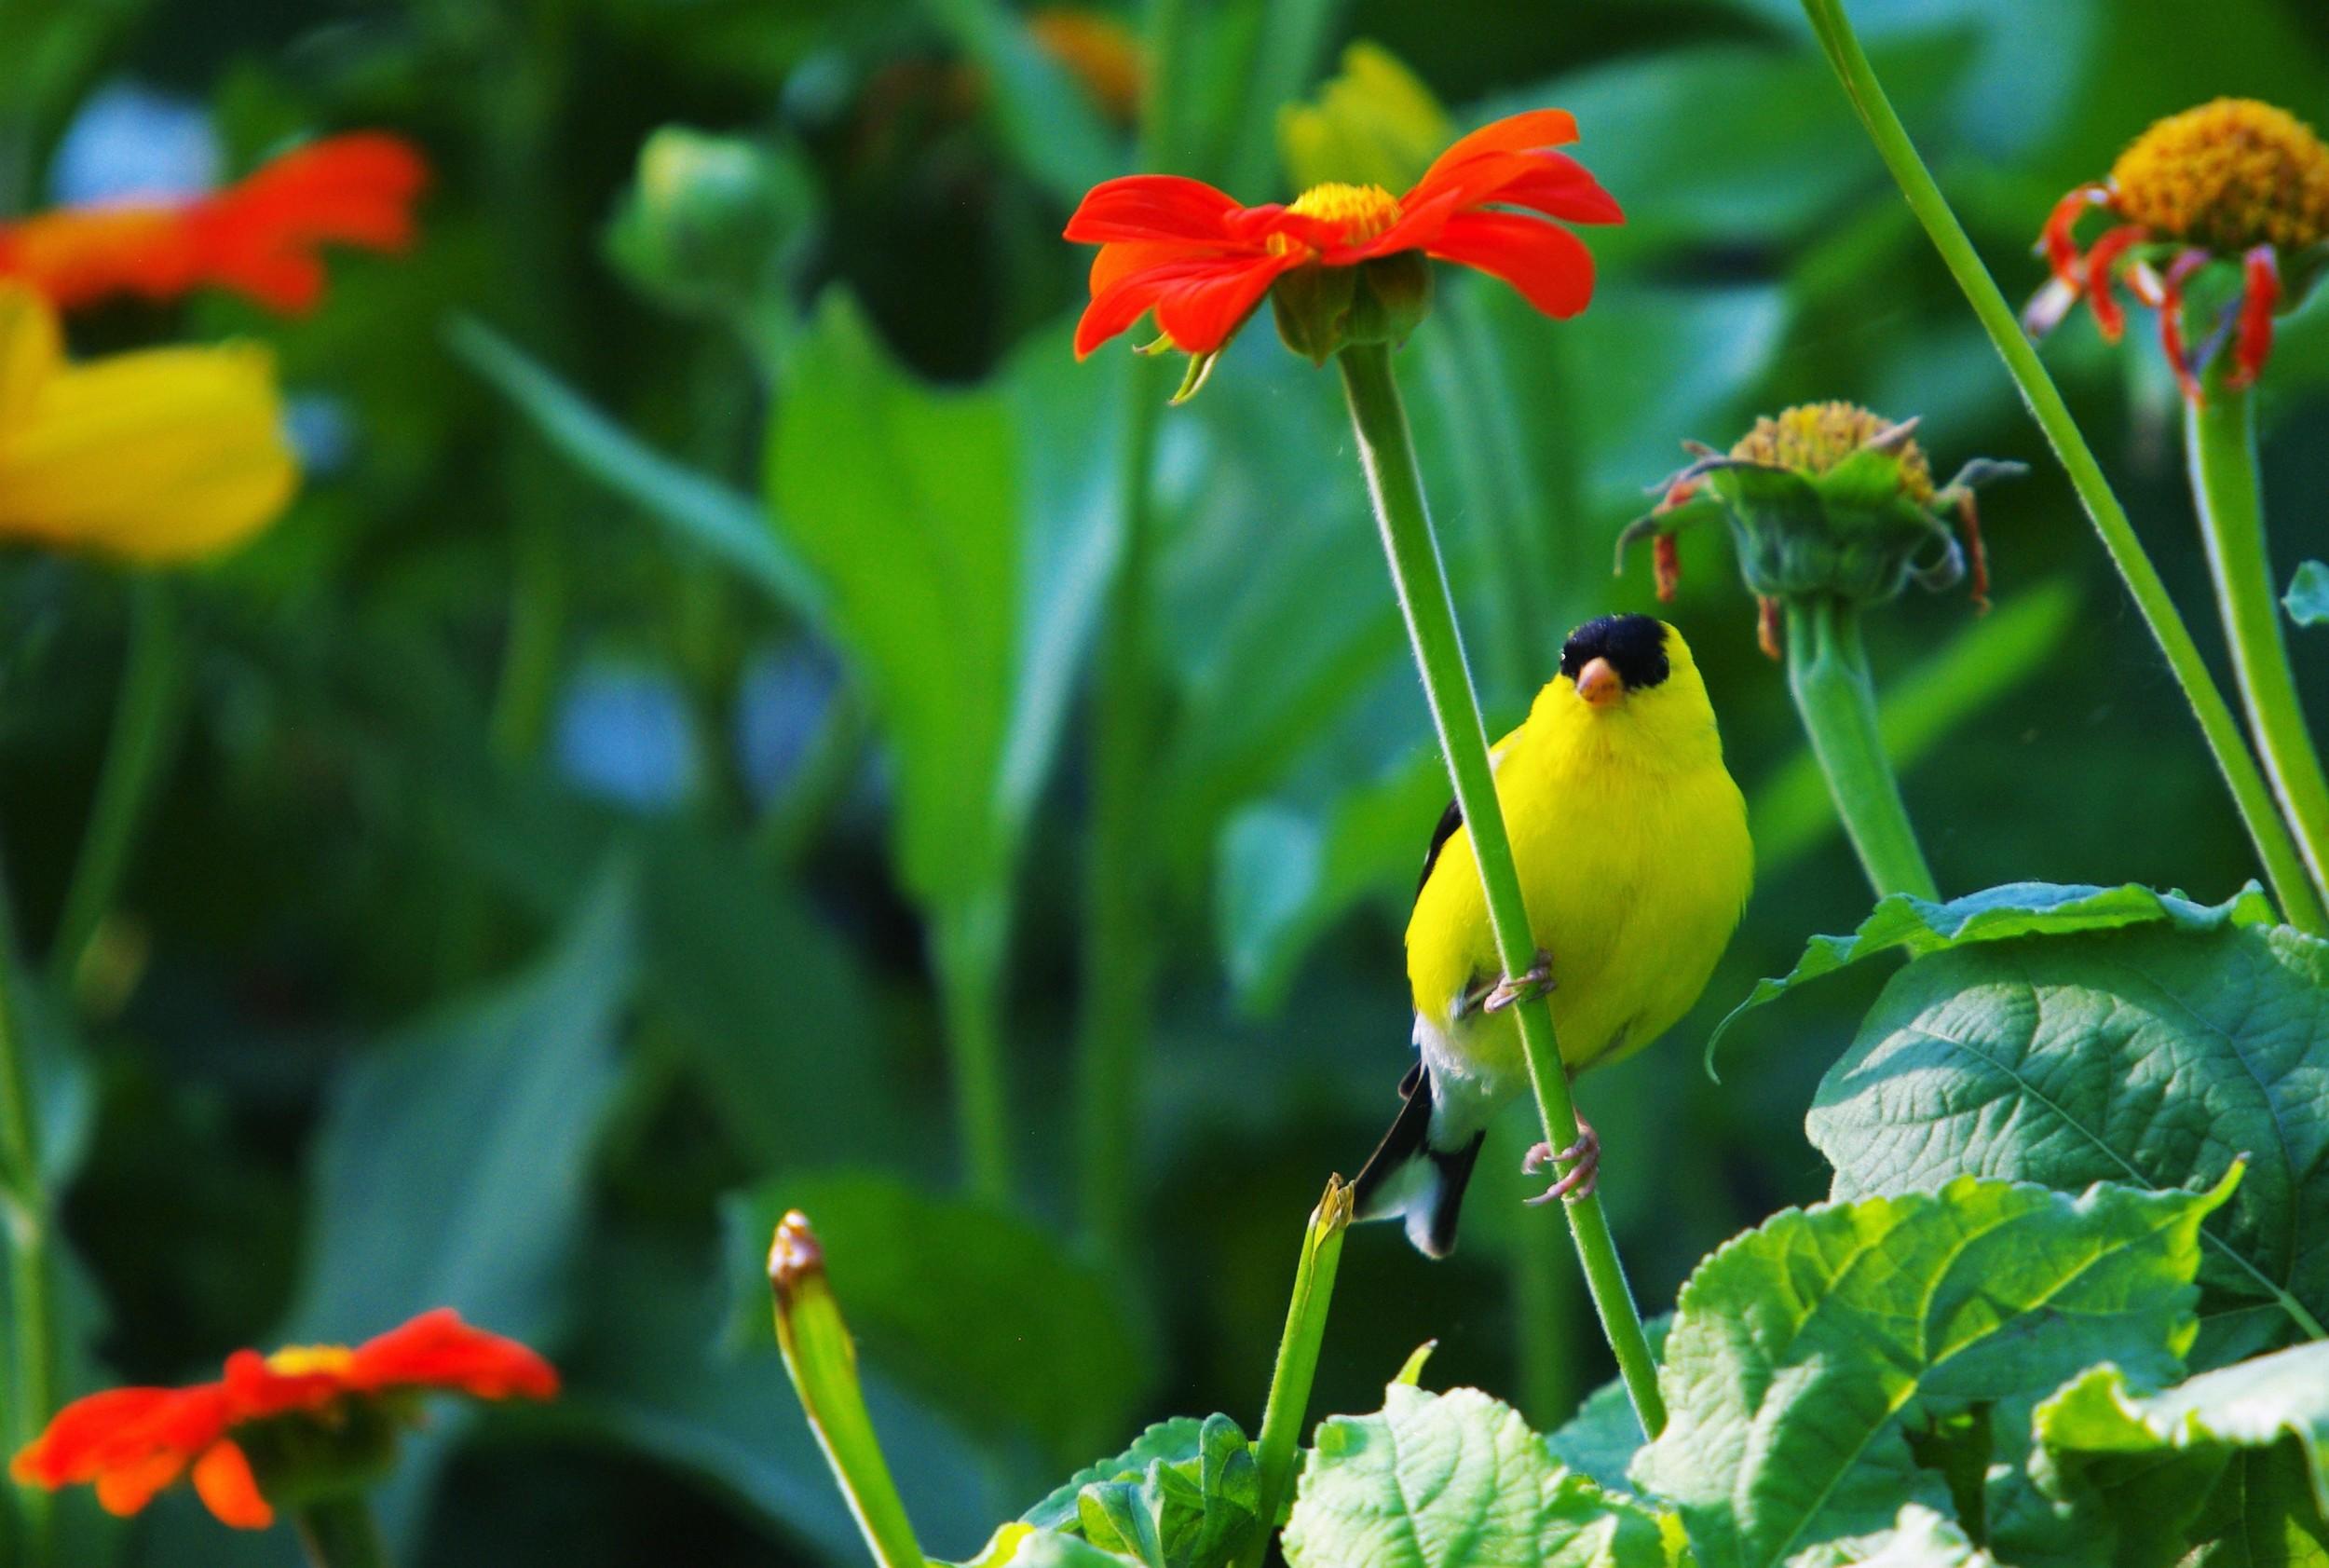 yellow finch on display2016.jpg